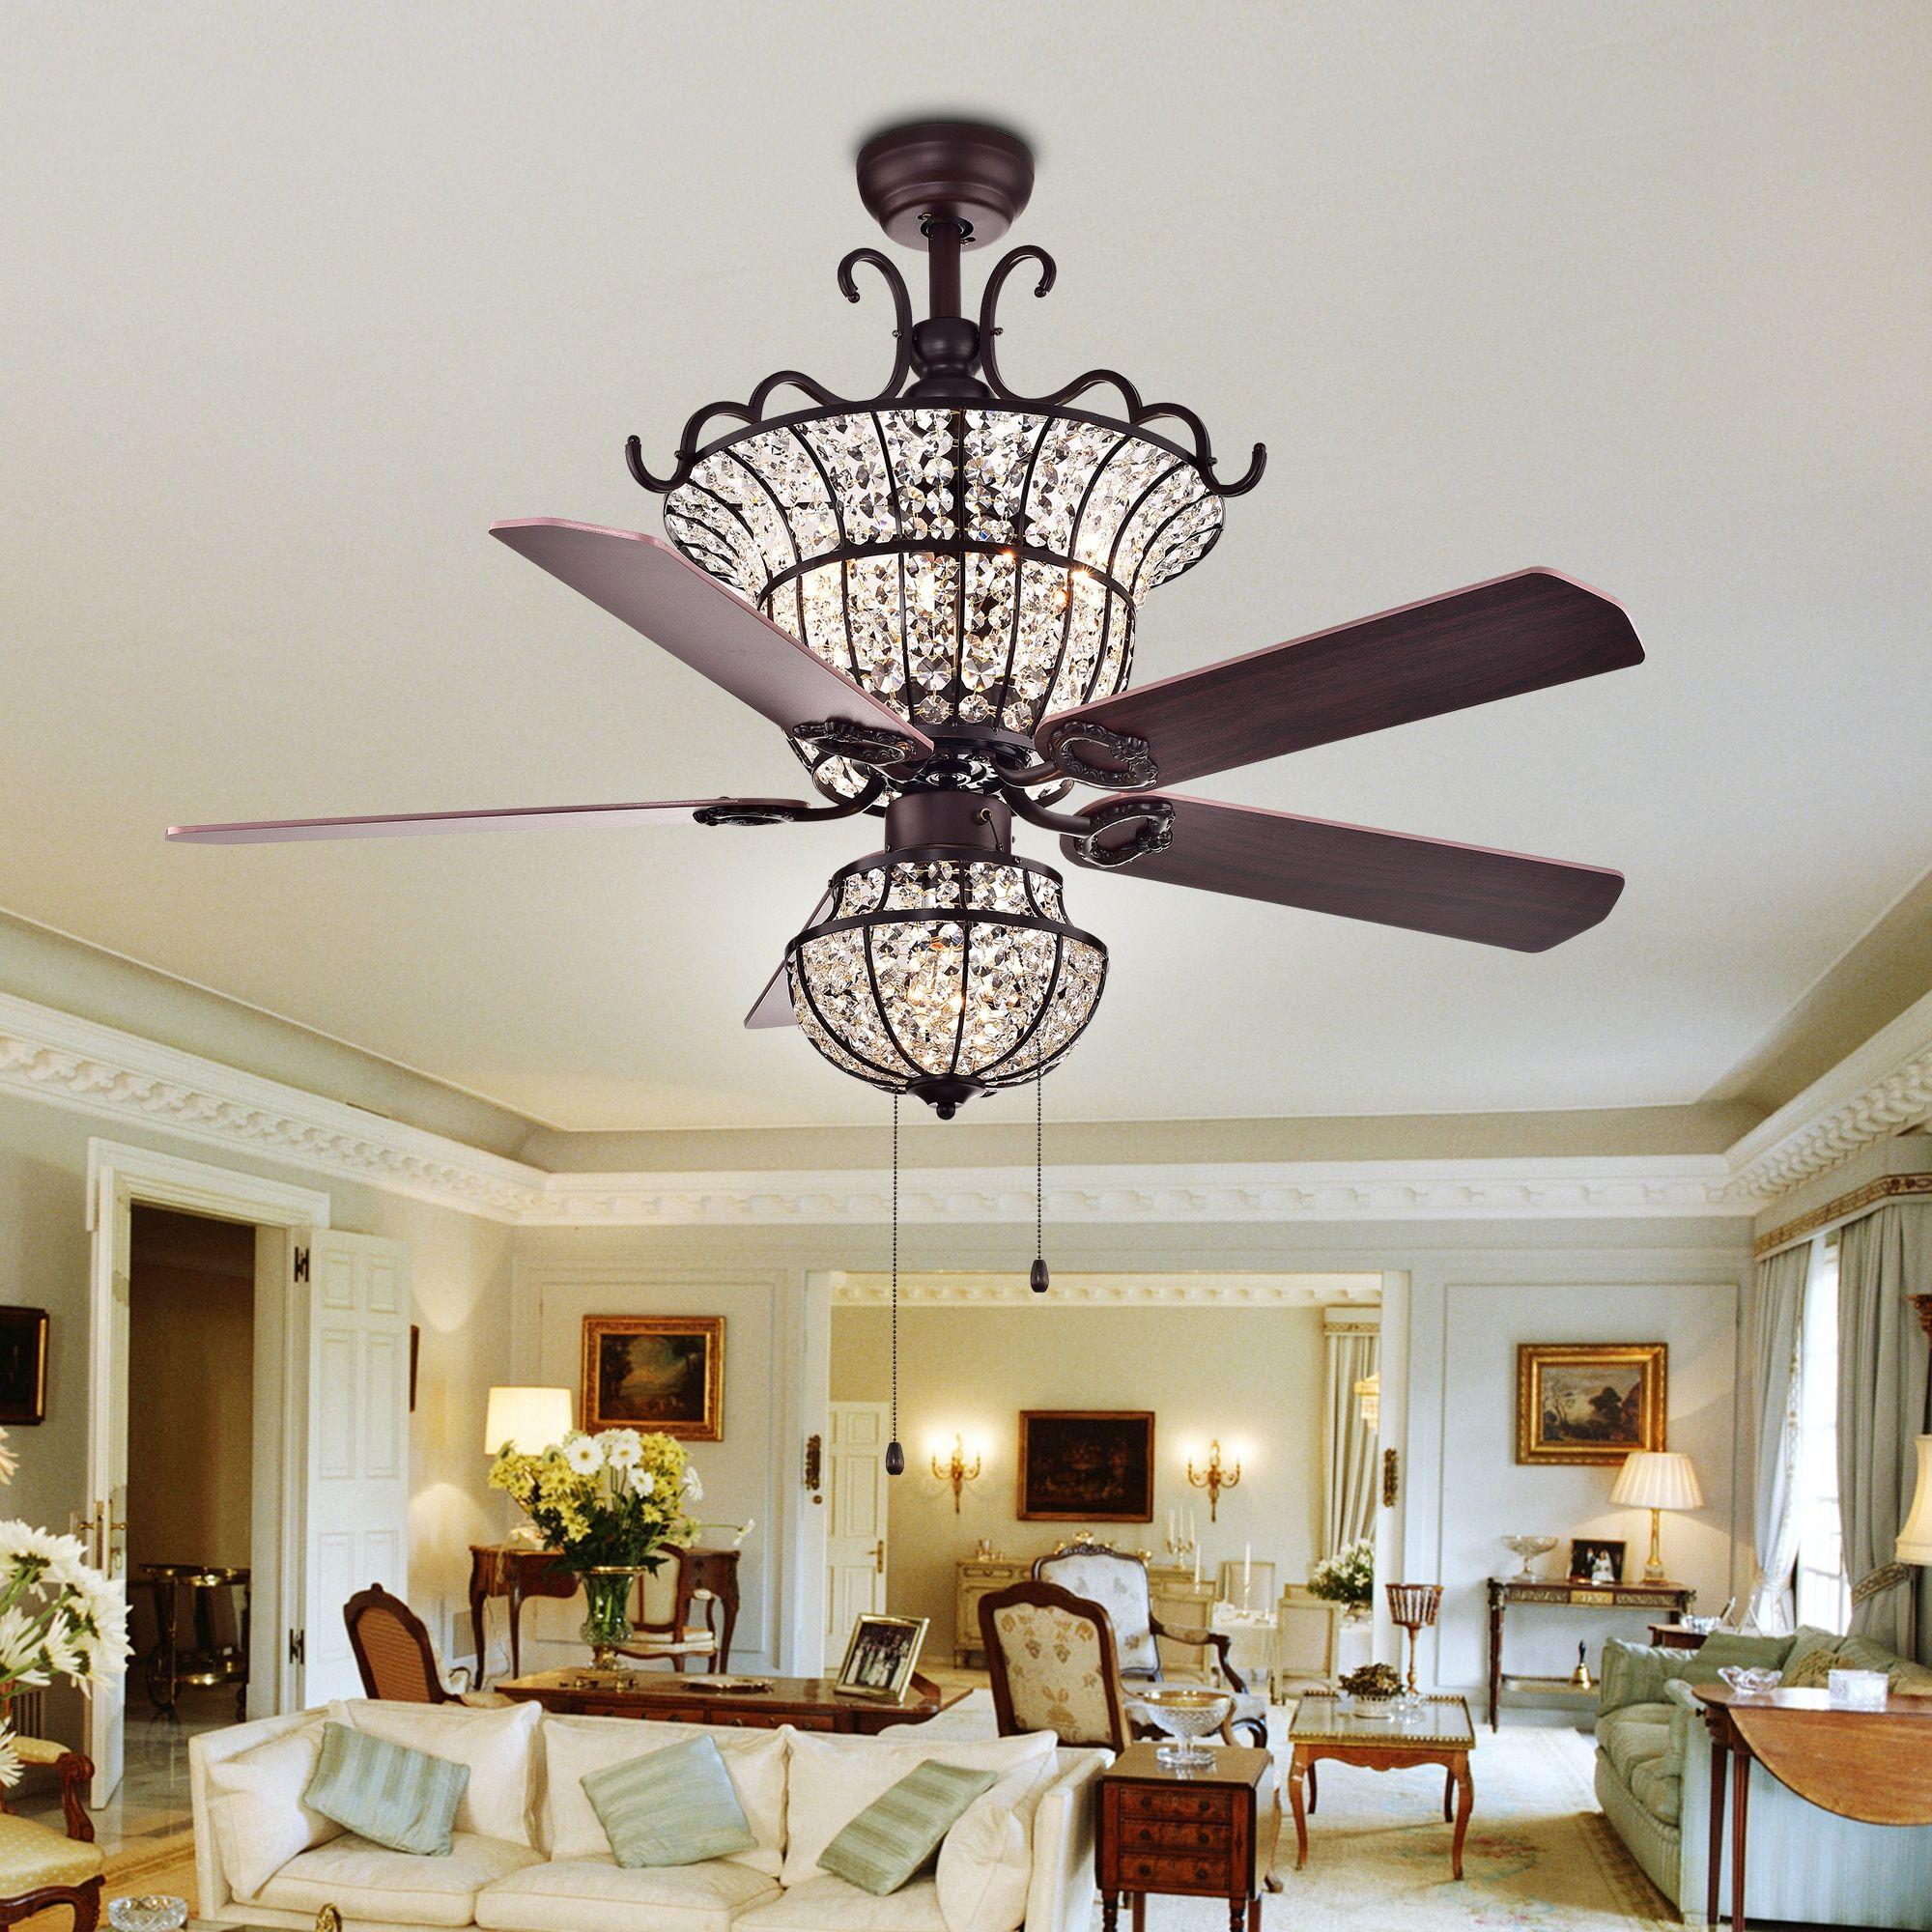 Warehouse Of Tiffany Charla 4 Light Crystal 52 Inch Chandelier Ceiling Fan